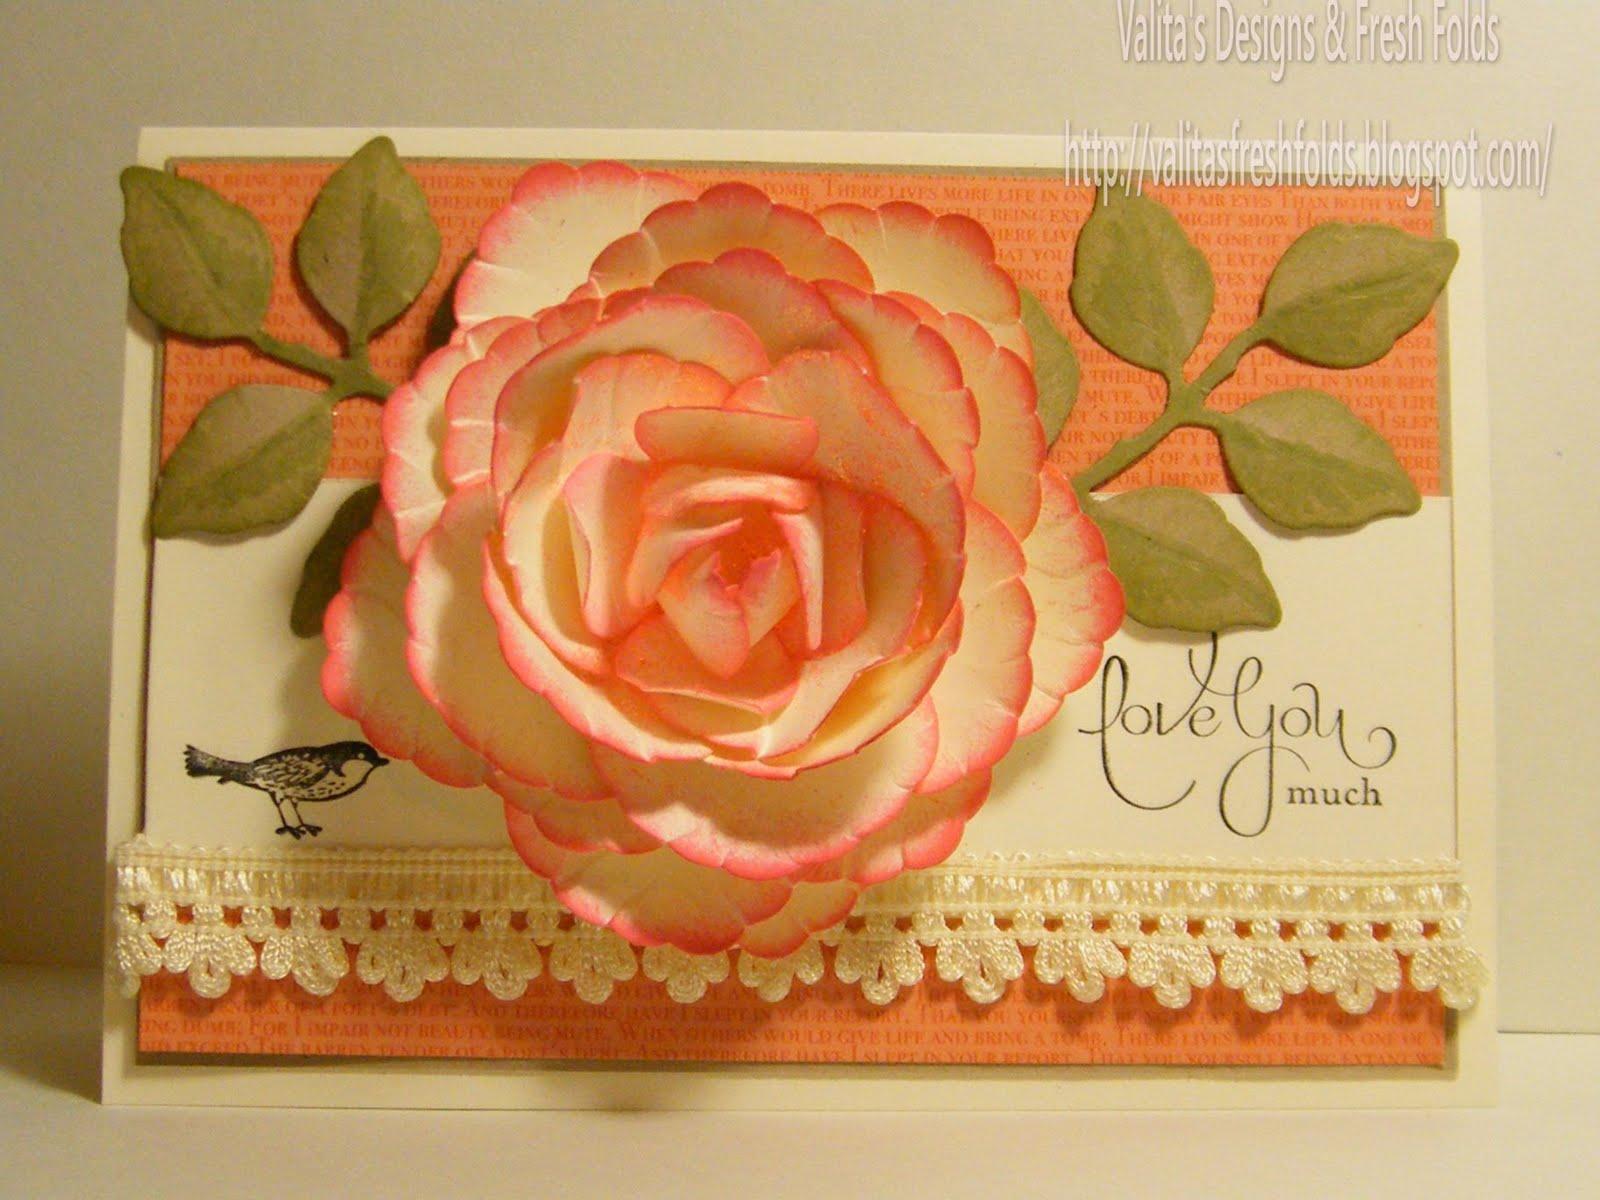 Valitas Designs Fresh Folds Making Paper Art Peony Flowers